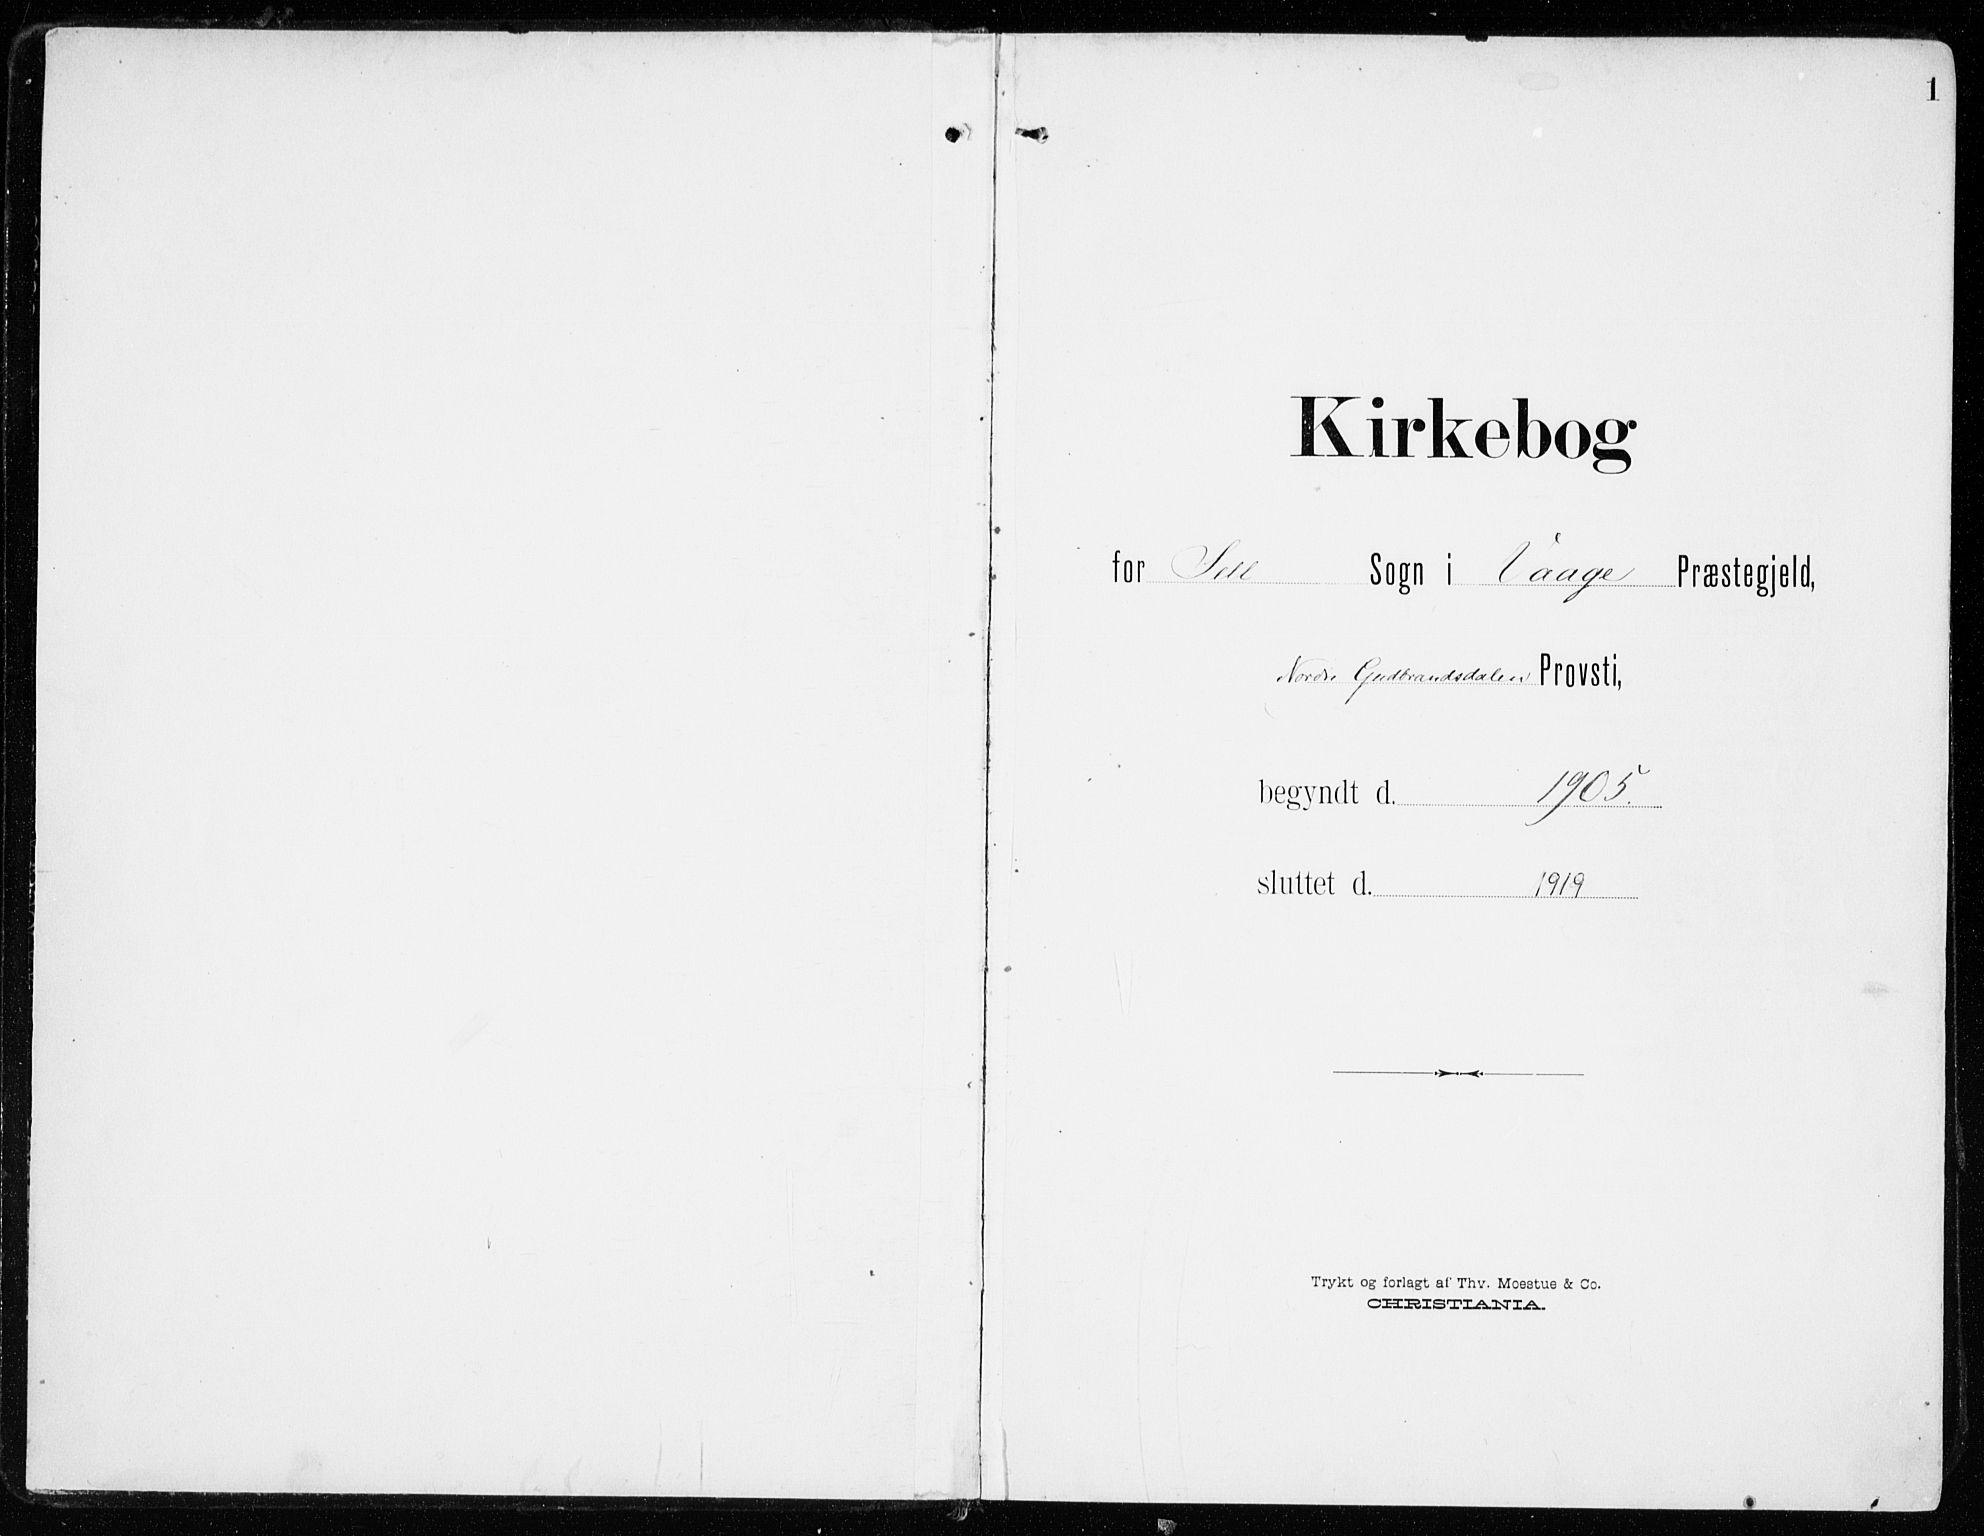 SAH, Sel prestekontor, Ministerialbok nr. 2, 1905-1919, s. 1